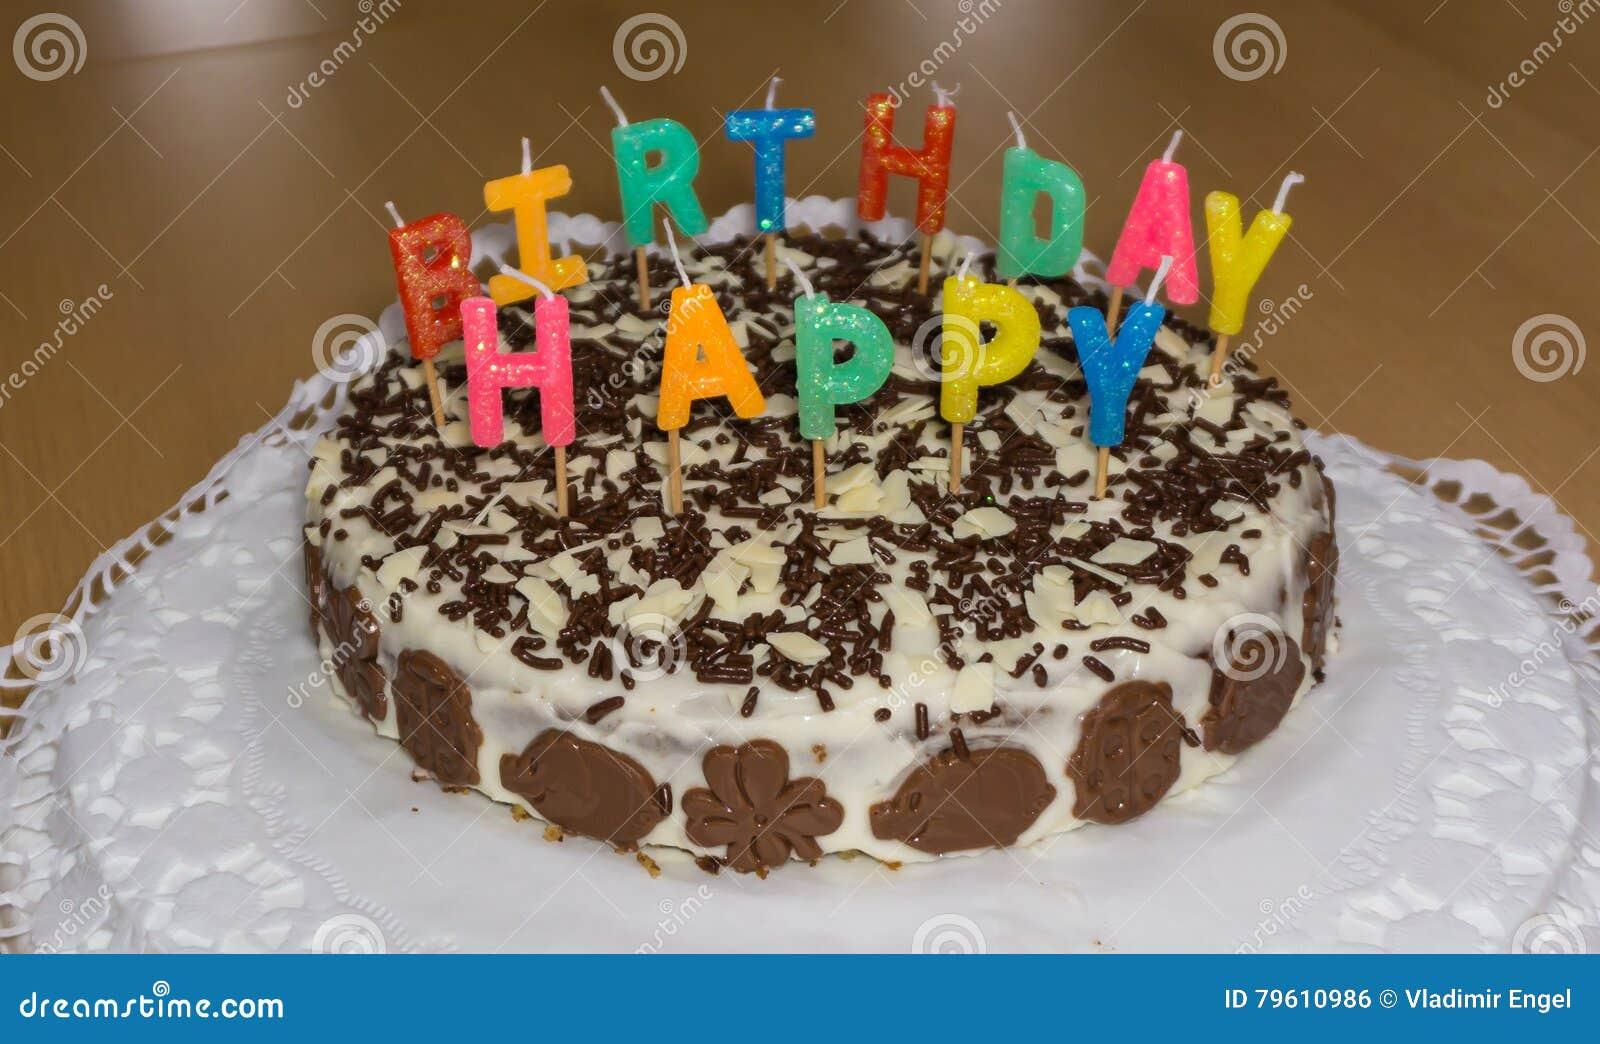 Birthday Cake With Candles Happy Birthday Stock Photo Image Of